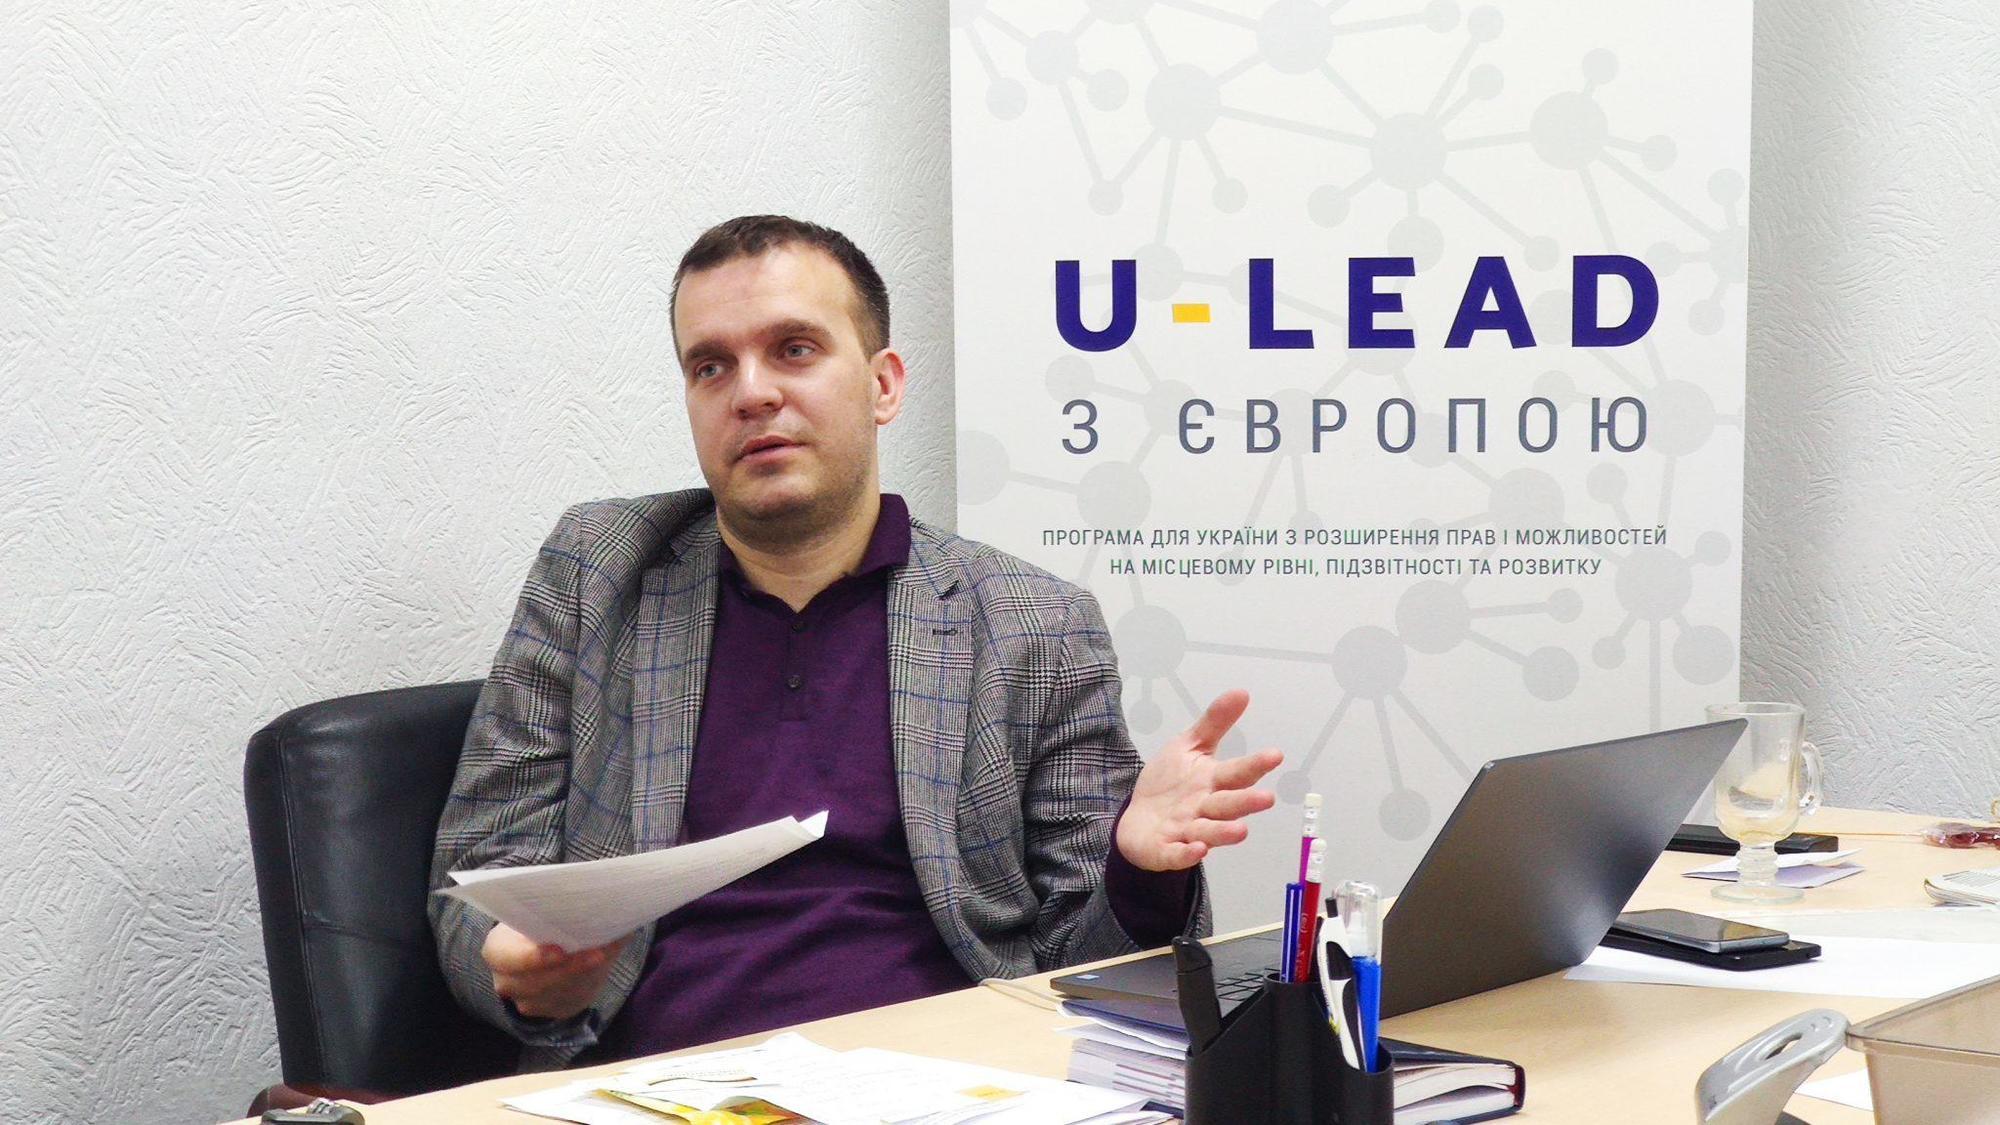 Максим Ткач, U-Lead